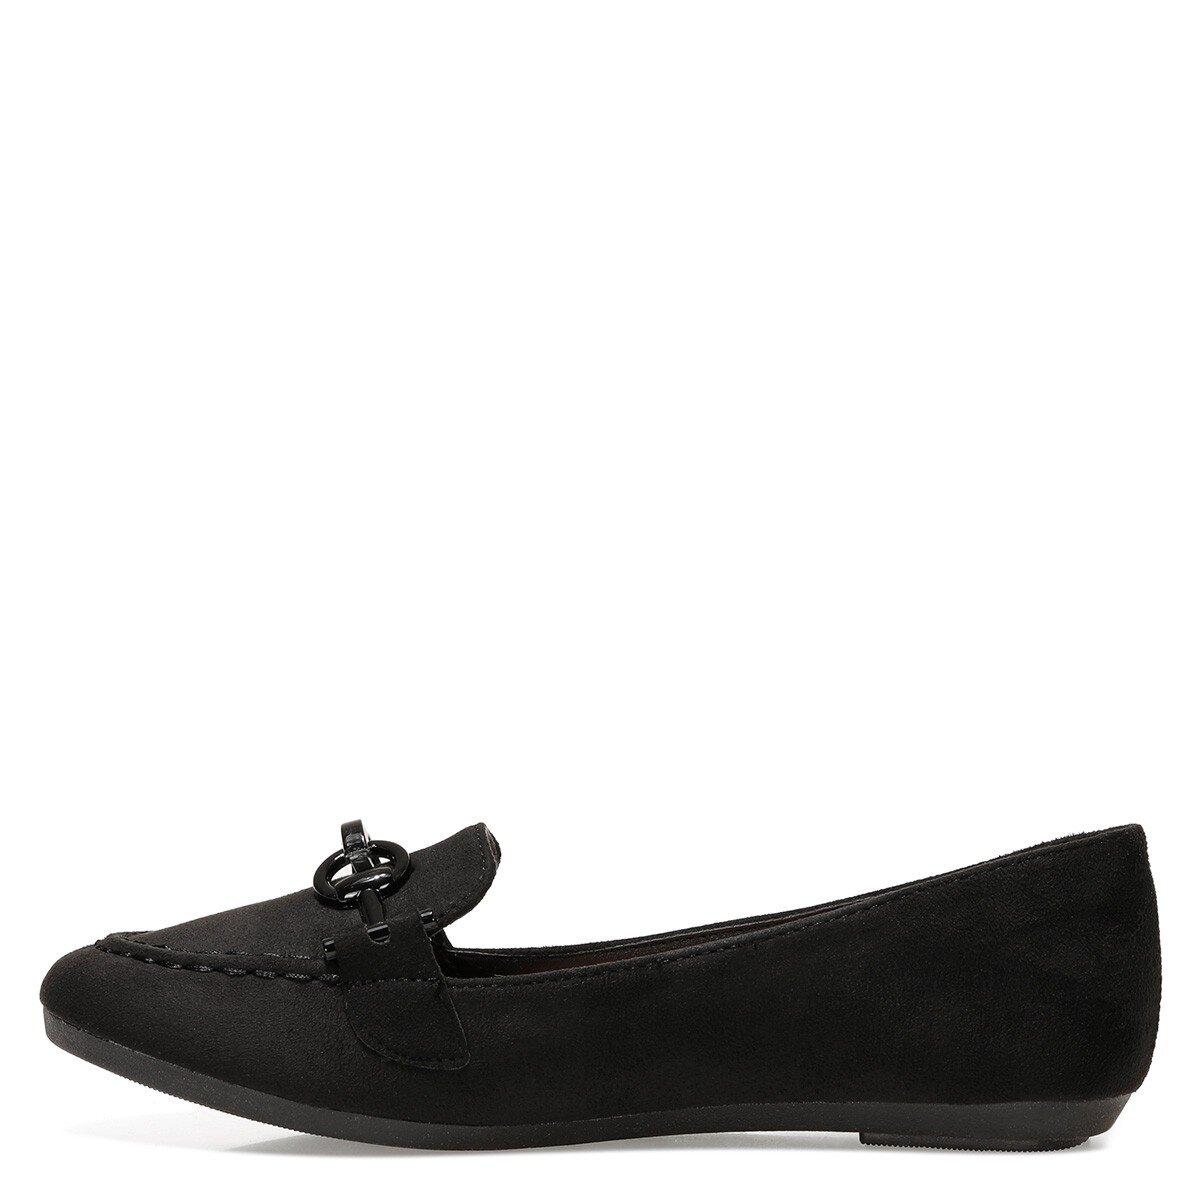 MAED 1FX Siyah Kadın Loafer